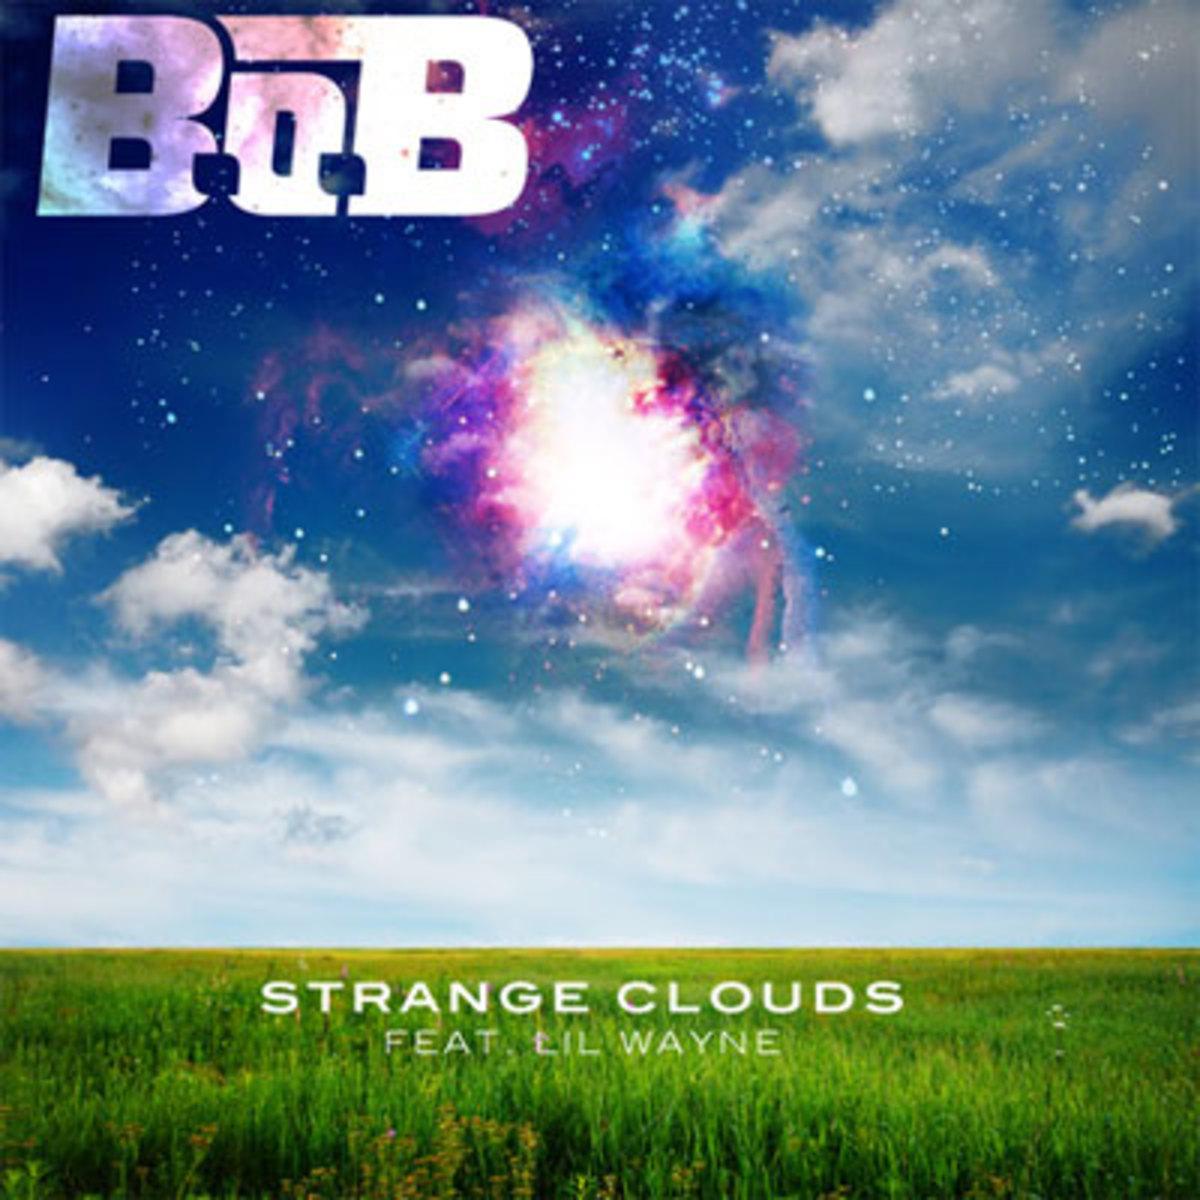 bob-strangeclouds.jpg